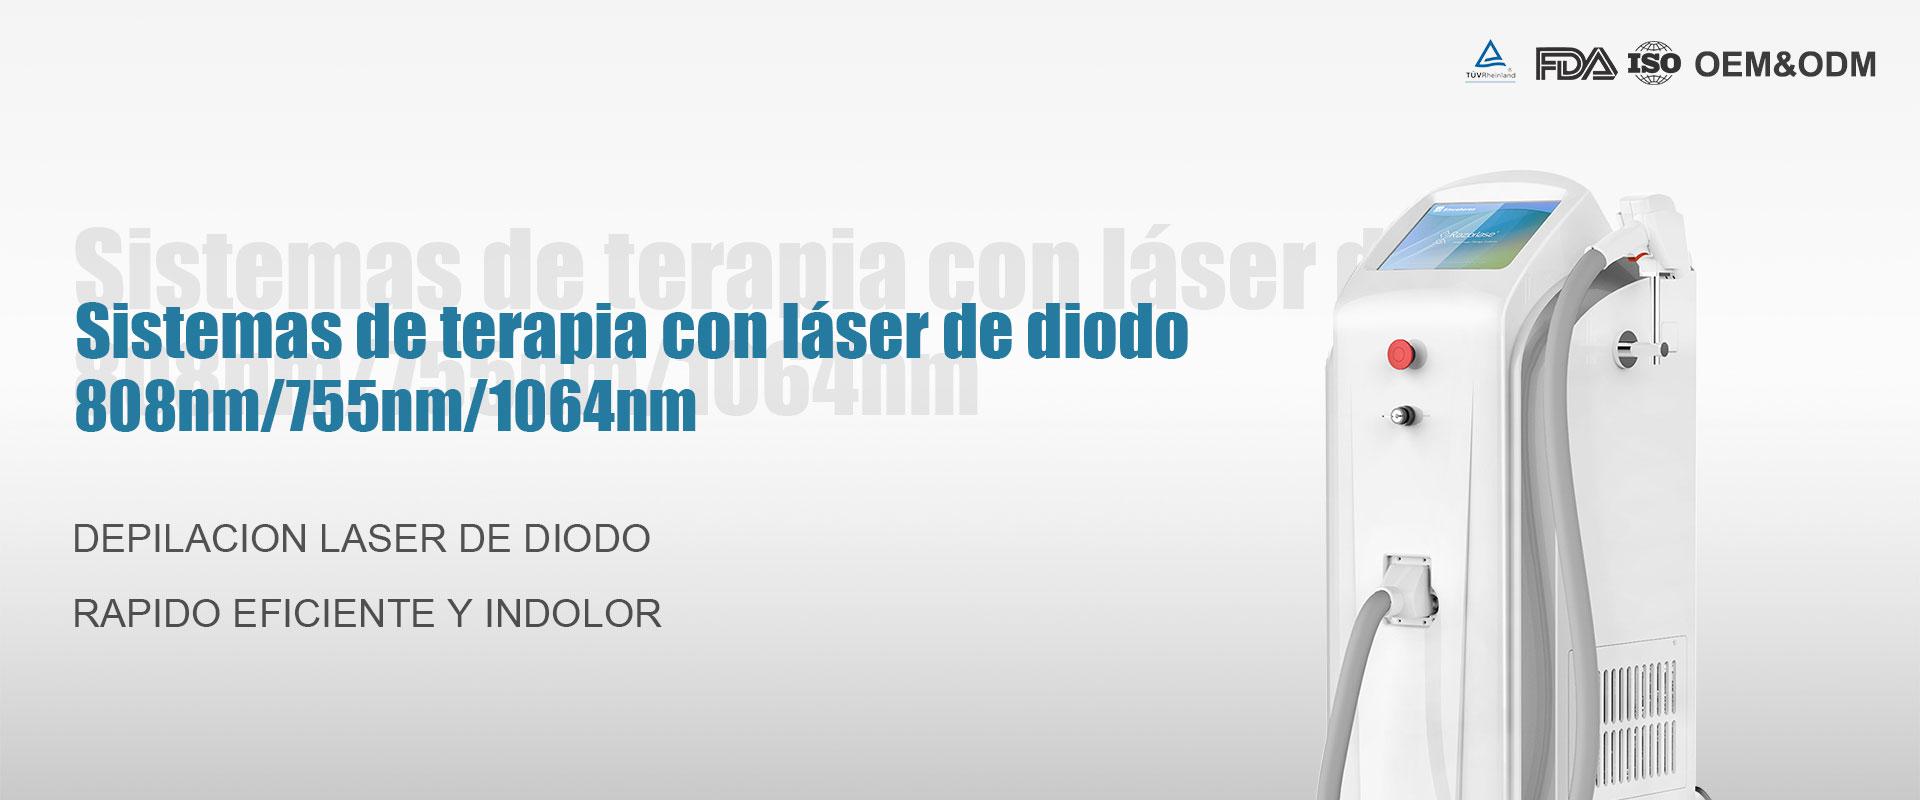 Depilación láser de diodo